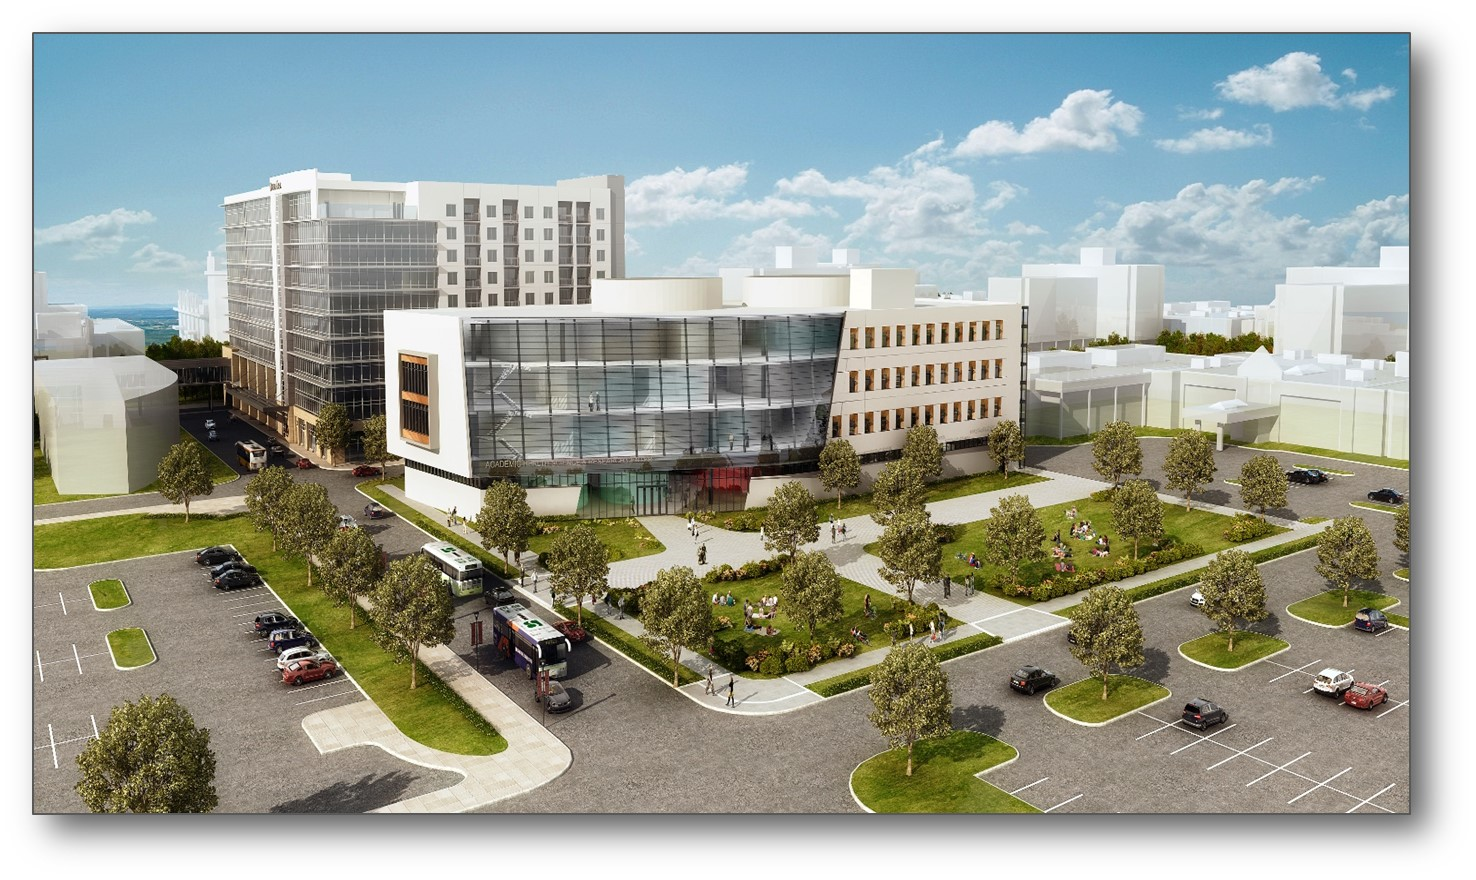 IU Medical School